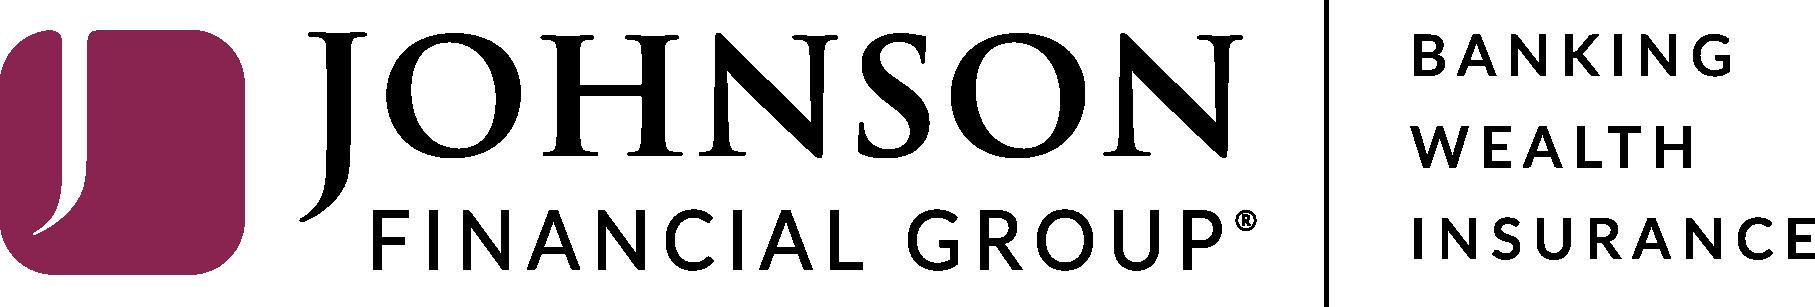 Security Center | Johnson Financial Group